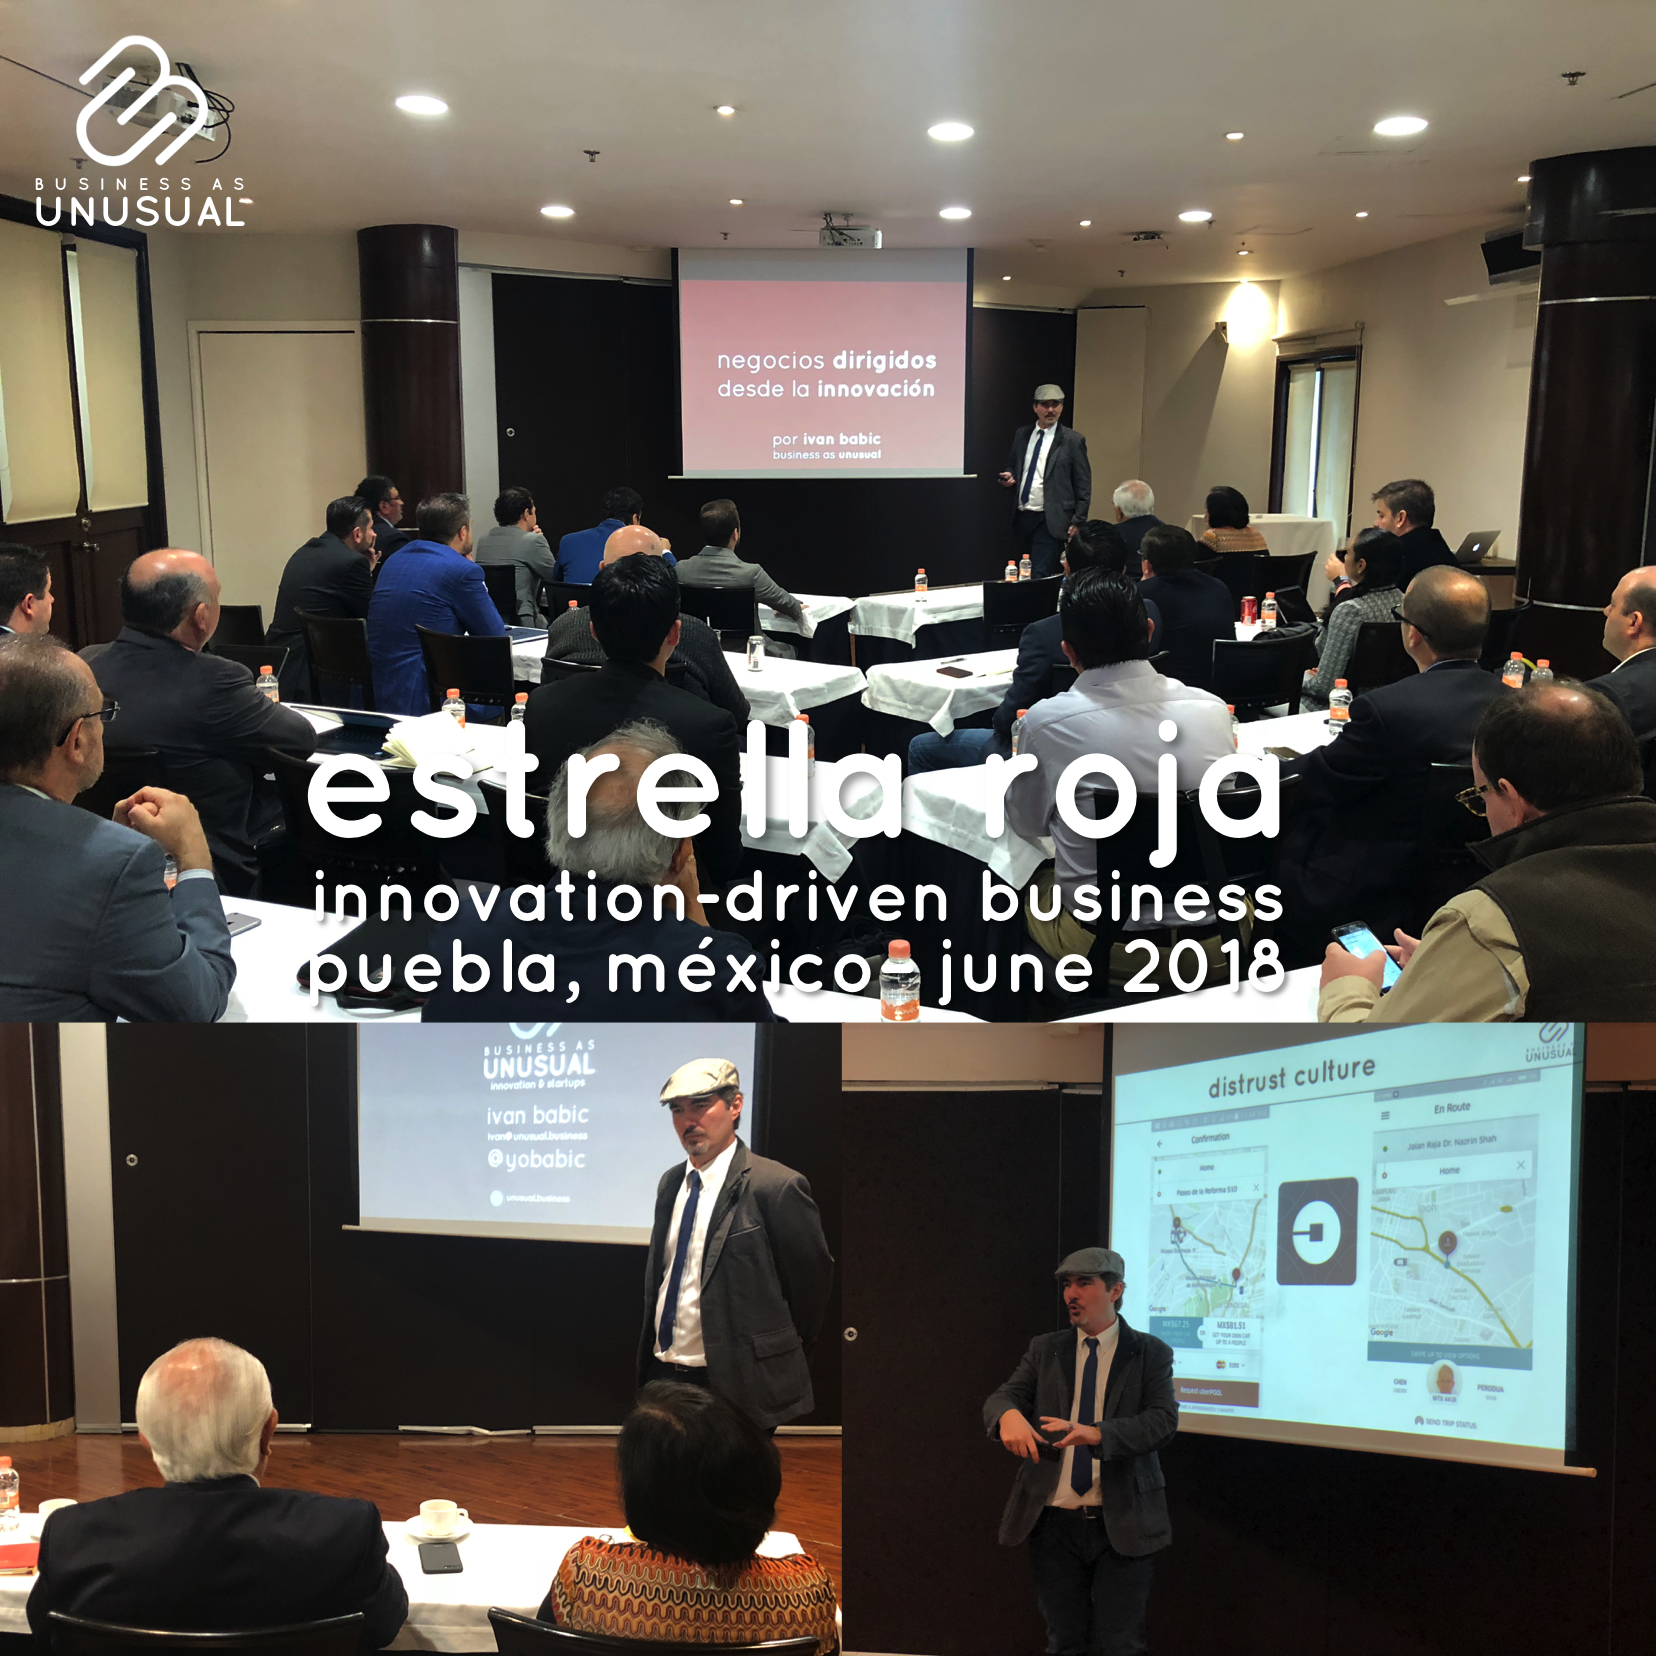 Estrella Roja - Innovation-Driven Business - Puebla 2018